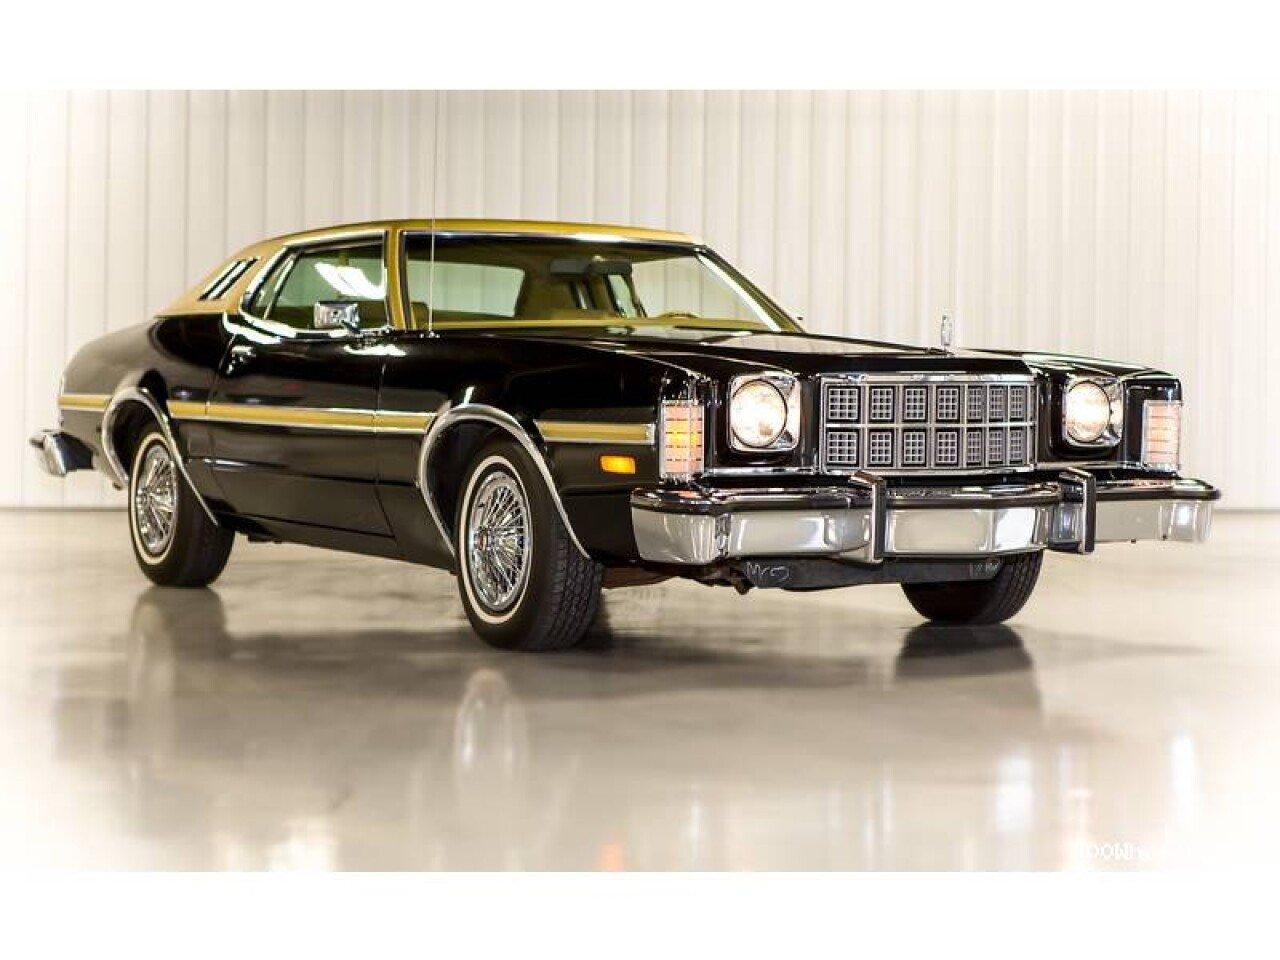 Contact Marick Auto Sales LLC: 1976 Ford Elite For Sale Near Cumming, Georgia 30041